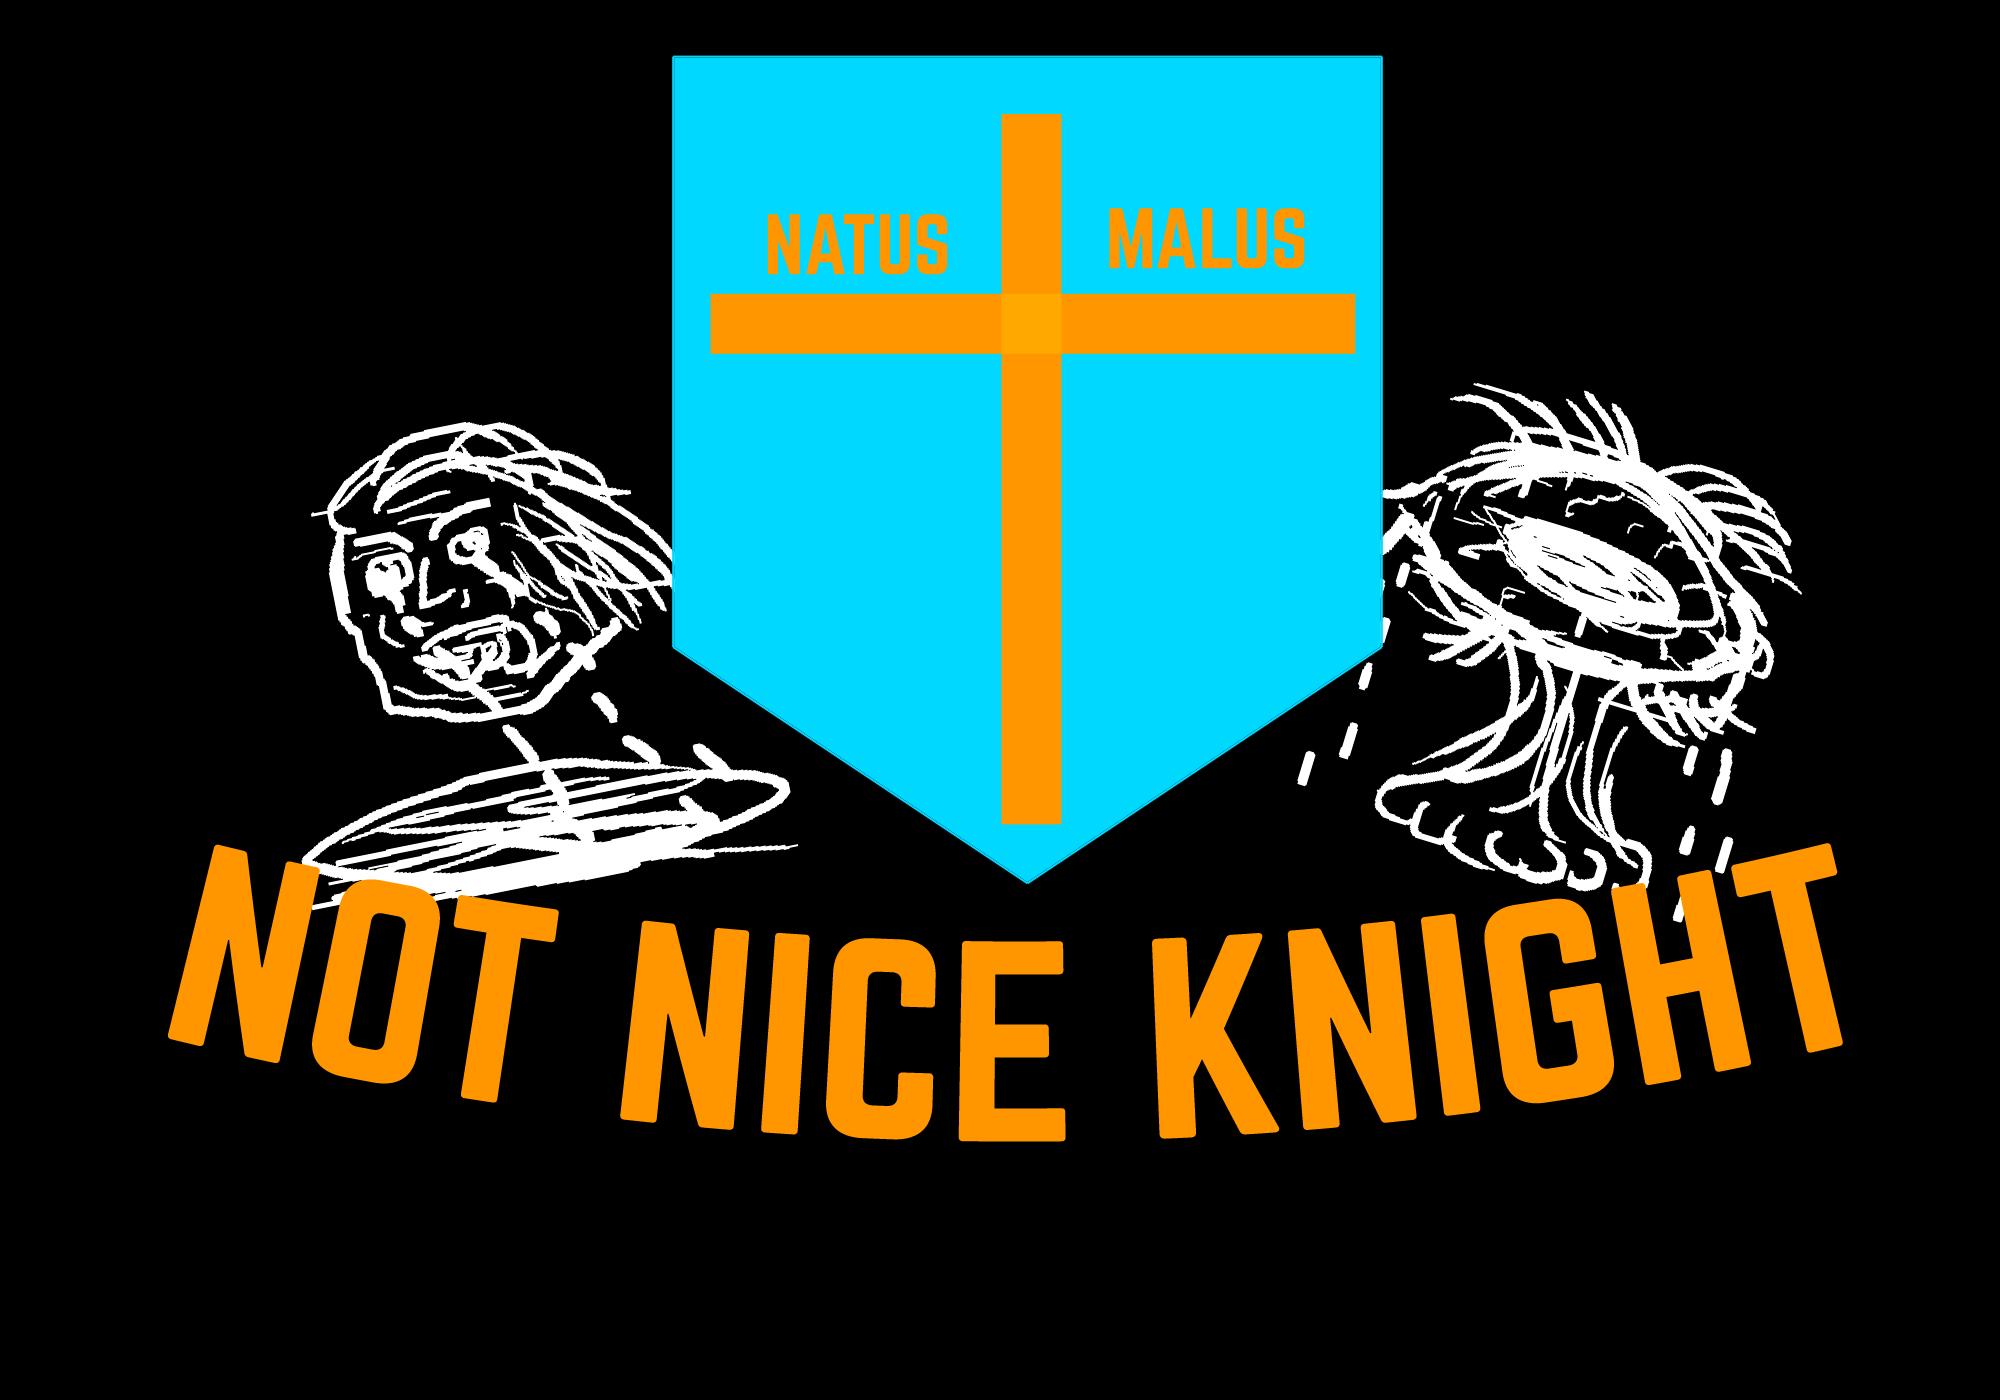 Not Nice Knight